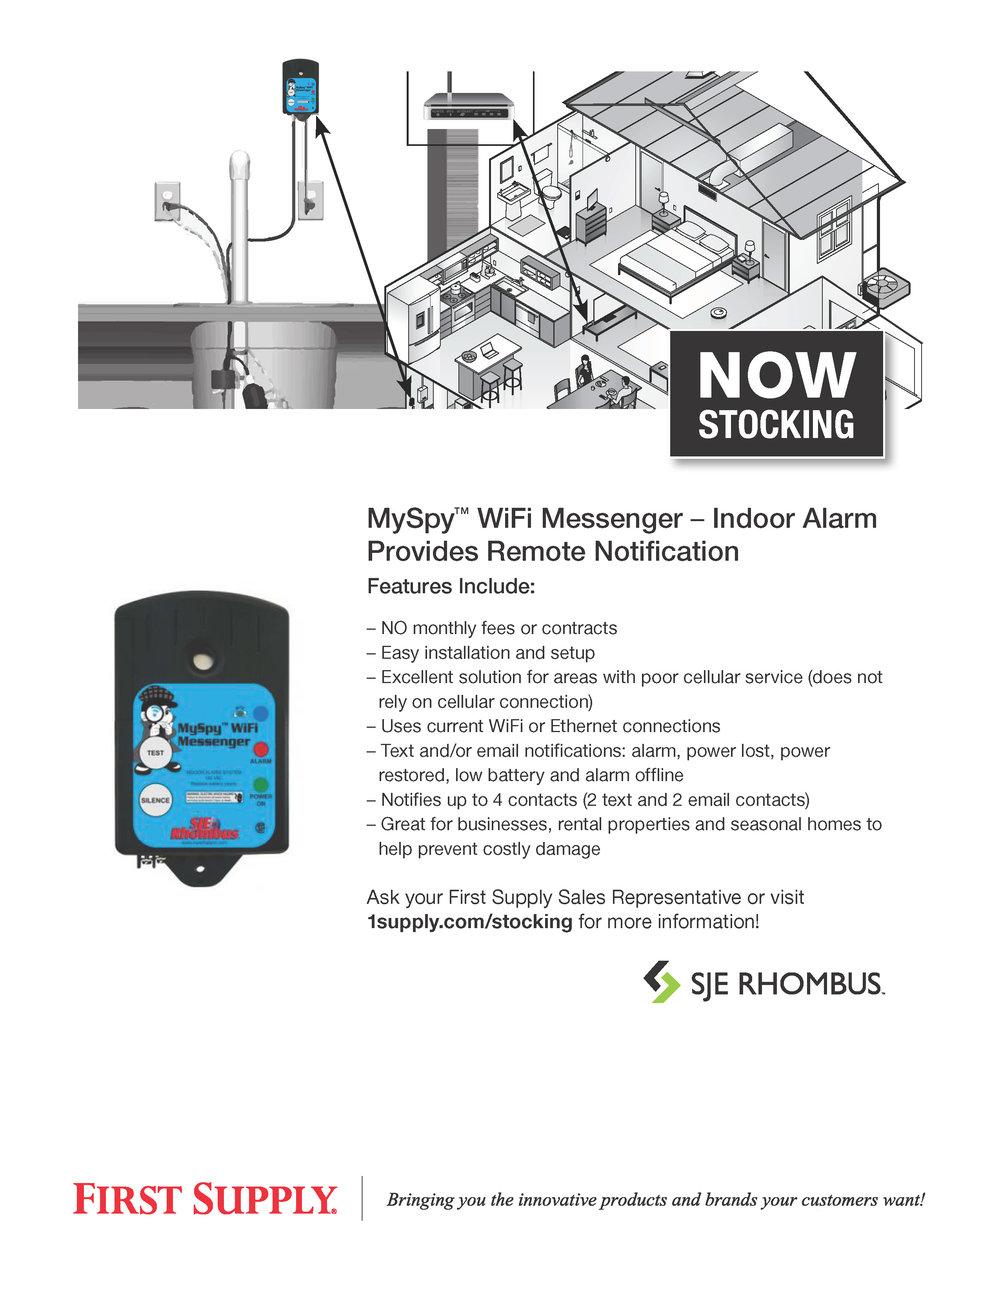 SJE-Rhombus MySpy™ WiFi Messenger [ download pdf ]